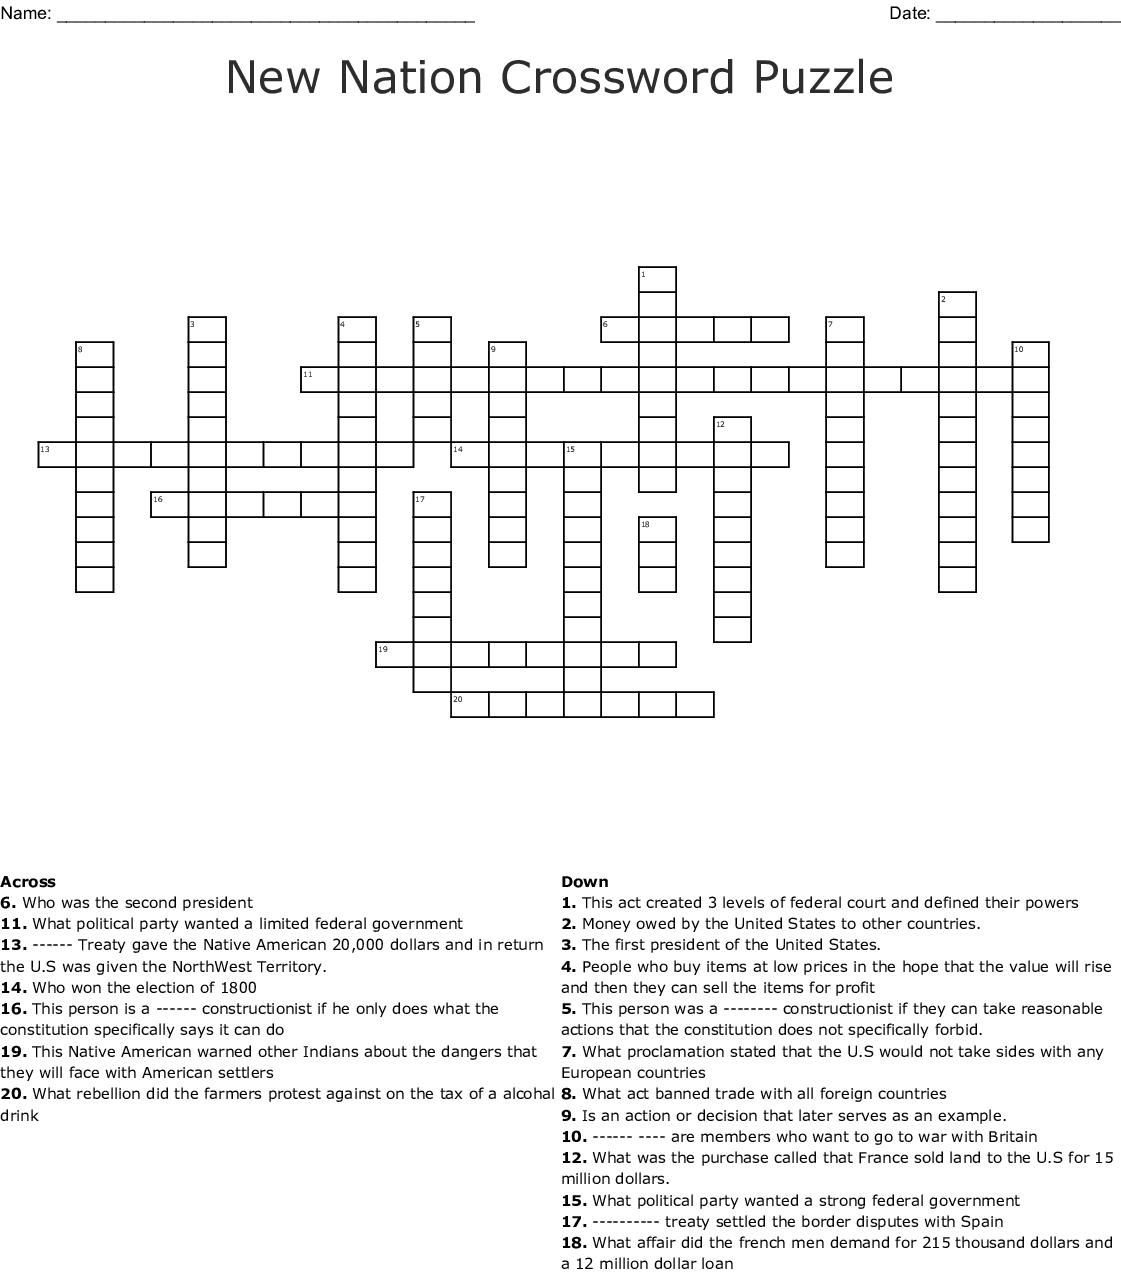 Indian Removal Vocab Crossword - WordMint